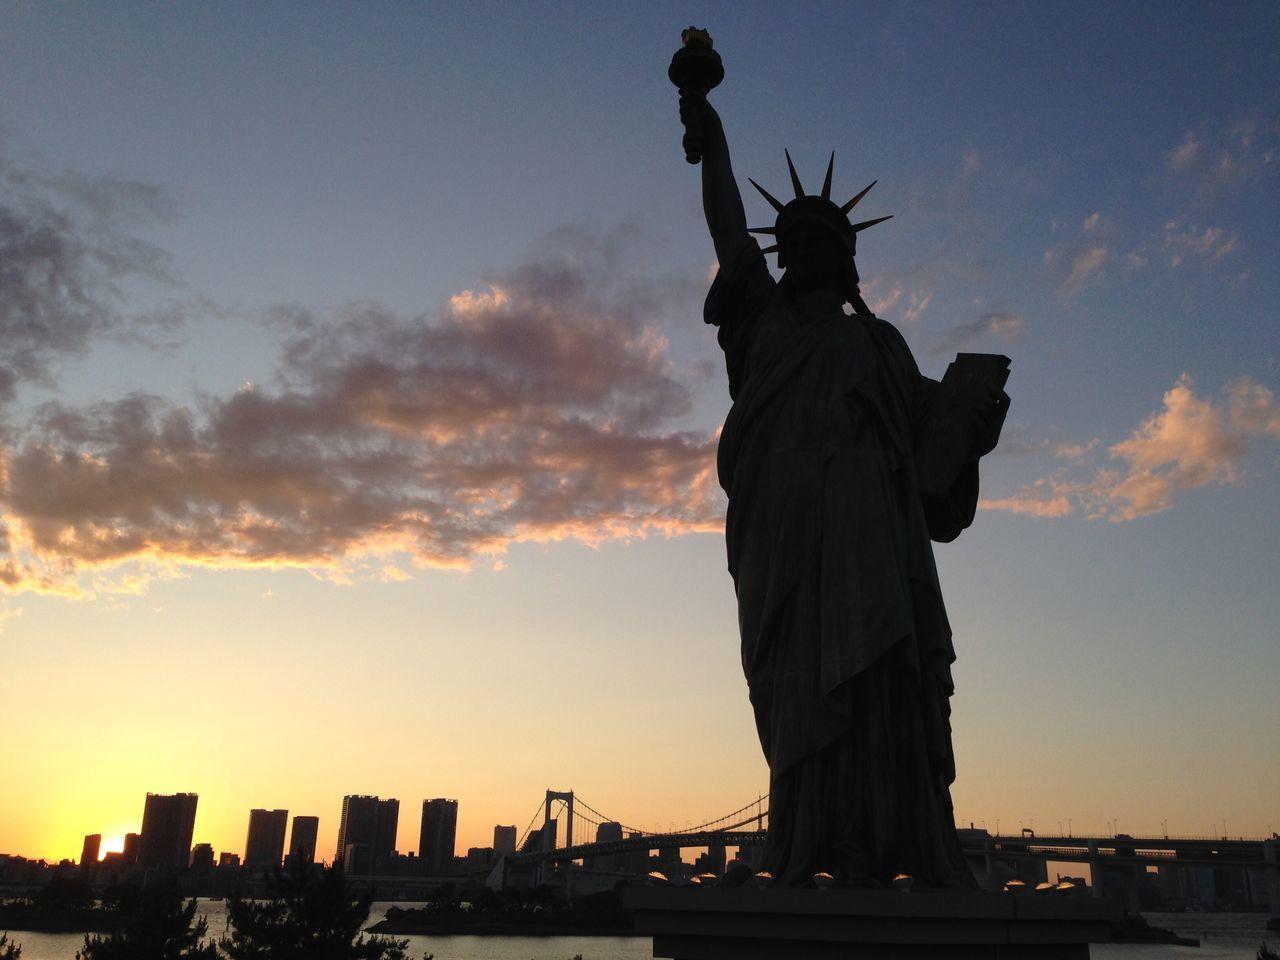 New York or ... Tokyo? Statue Travel Destinations Sunset Silhouette Tokyo Tokyo Bay Liberty Statue Japan